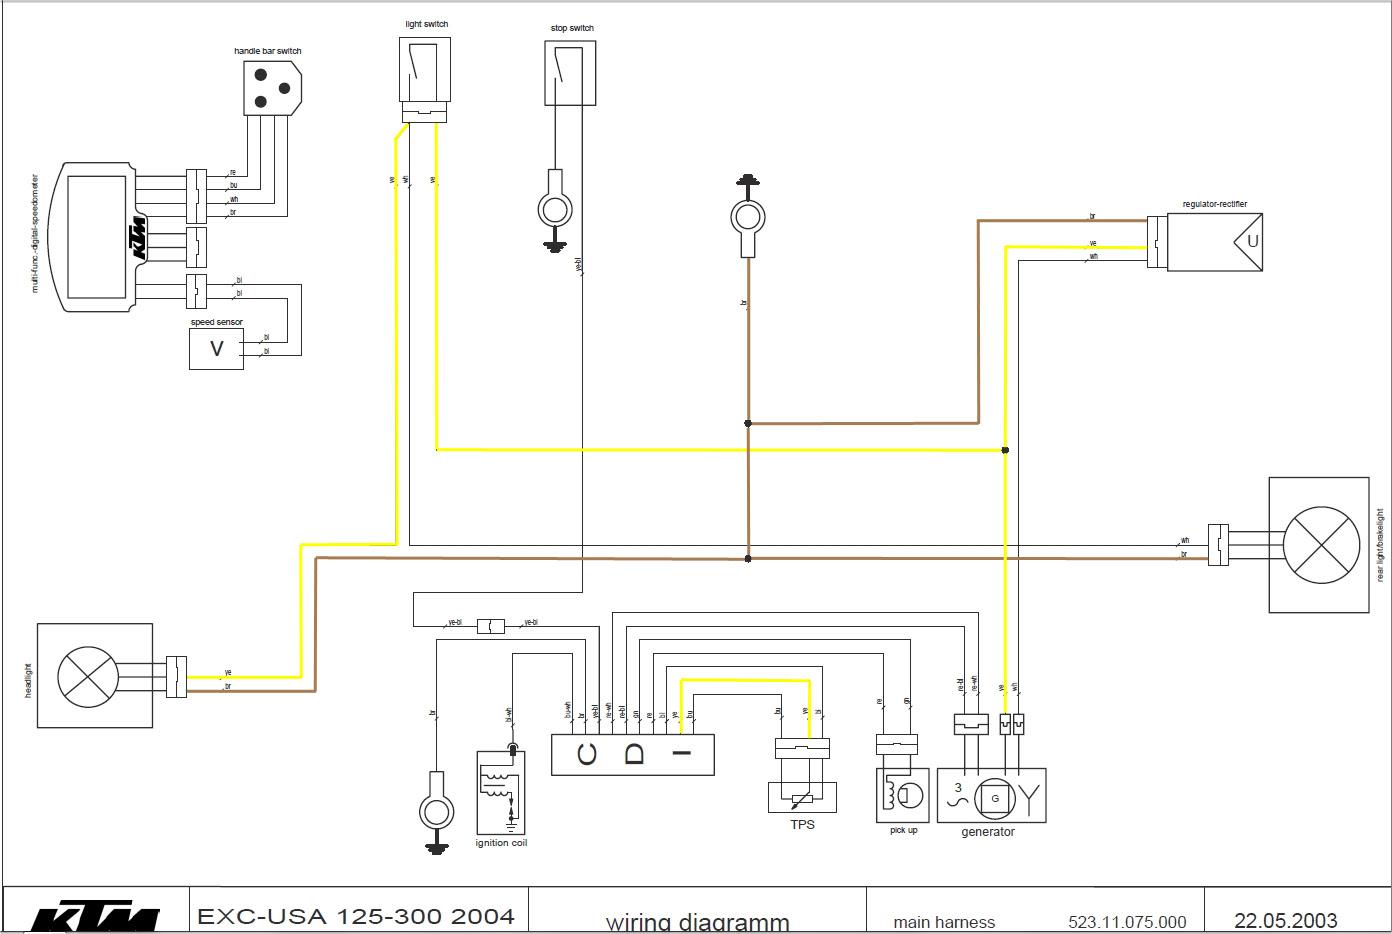 Ktm Headlight Wiring Diagram Wiring Diagram Seem Class Seem Class Saleebalocchi It